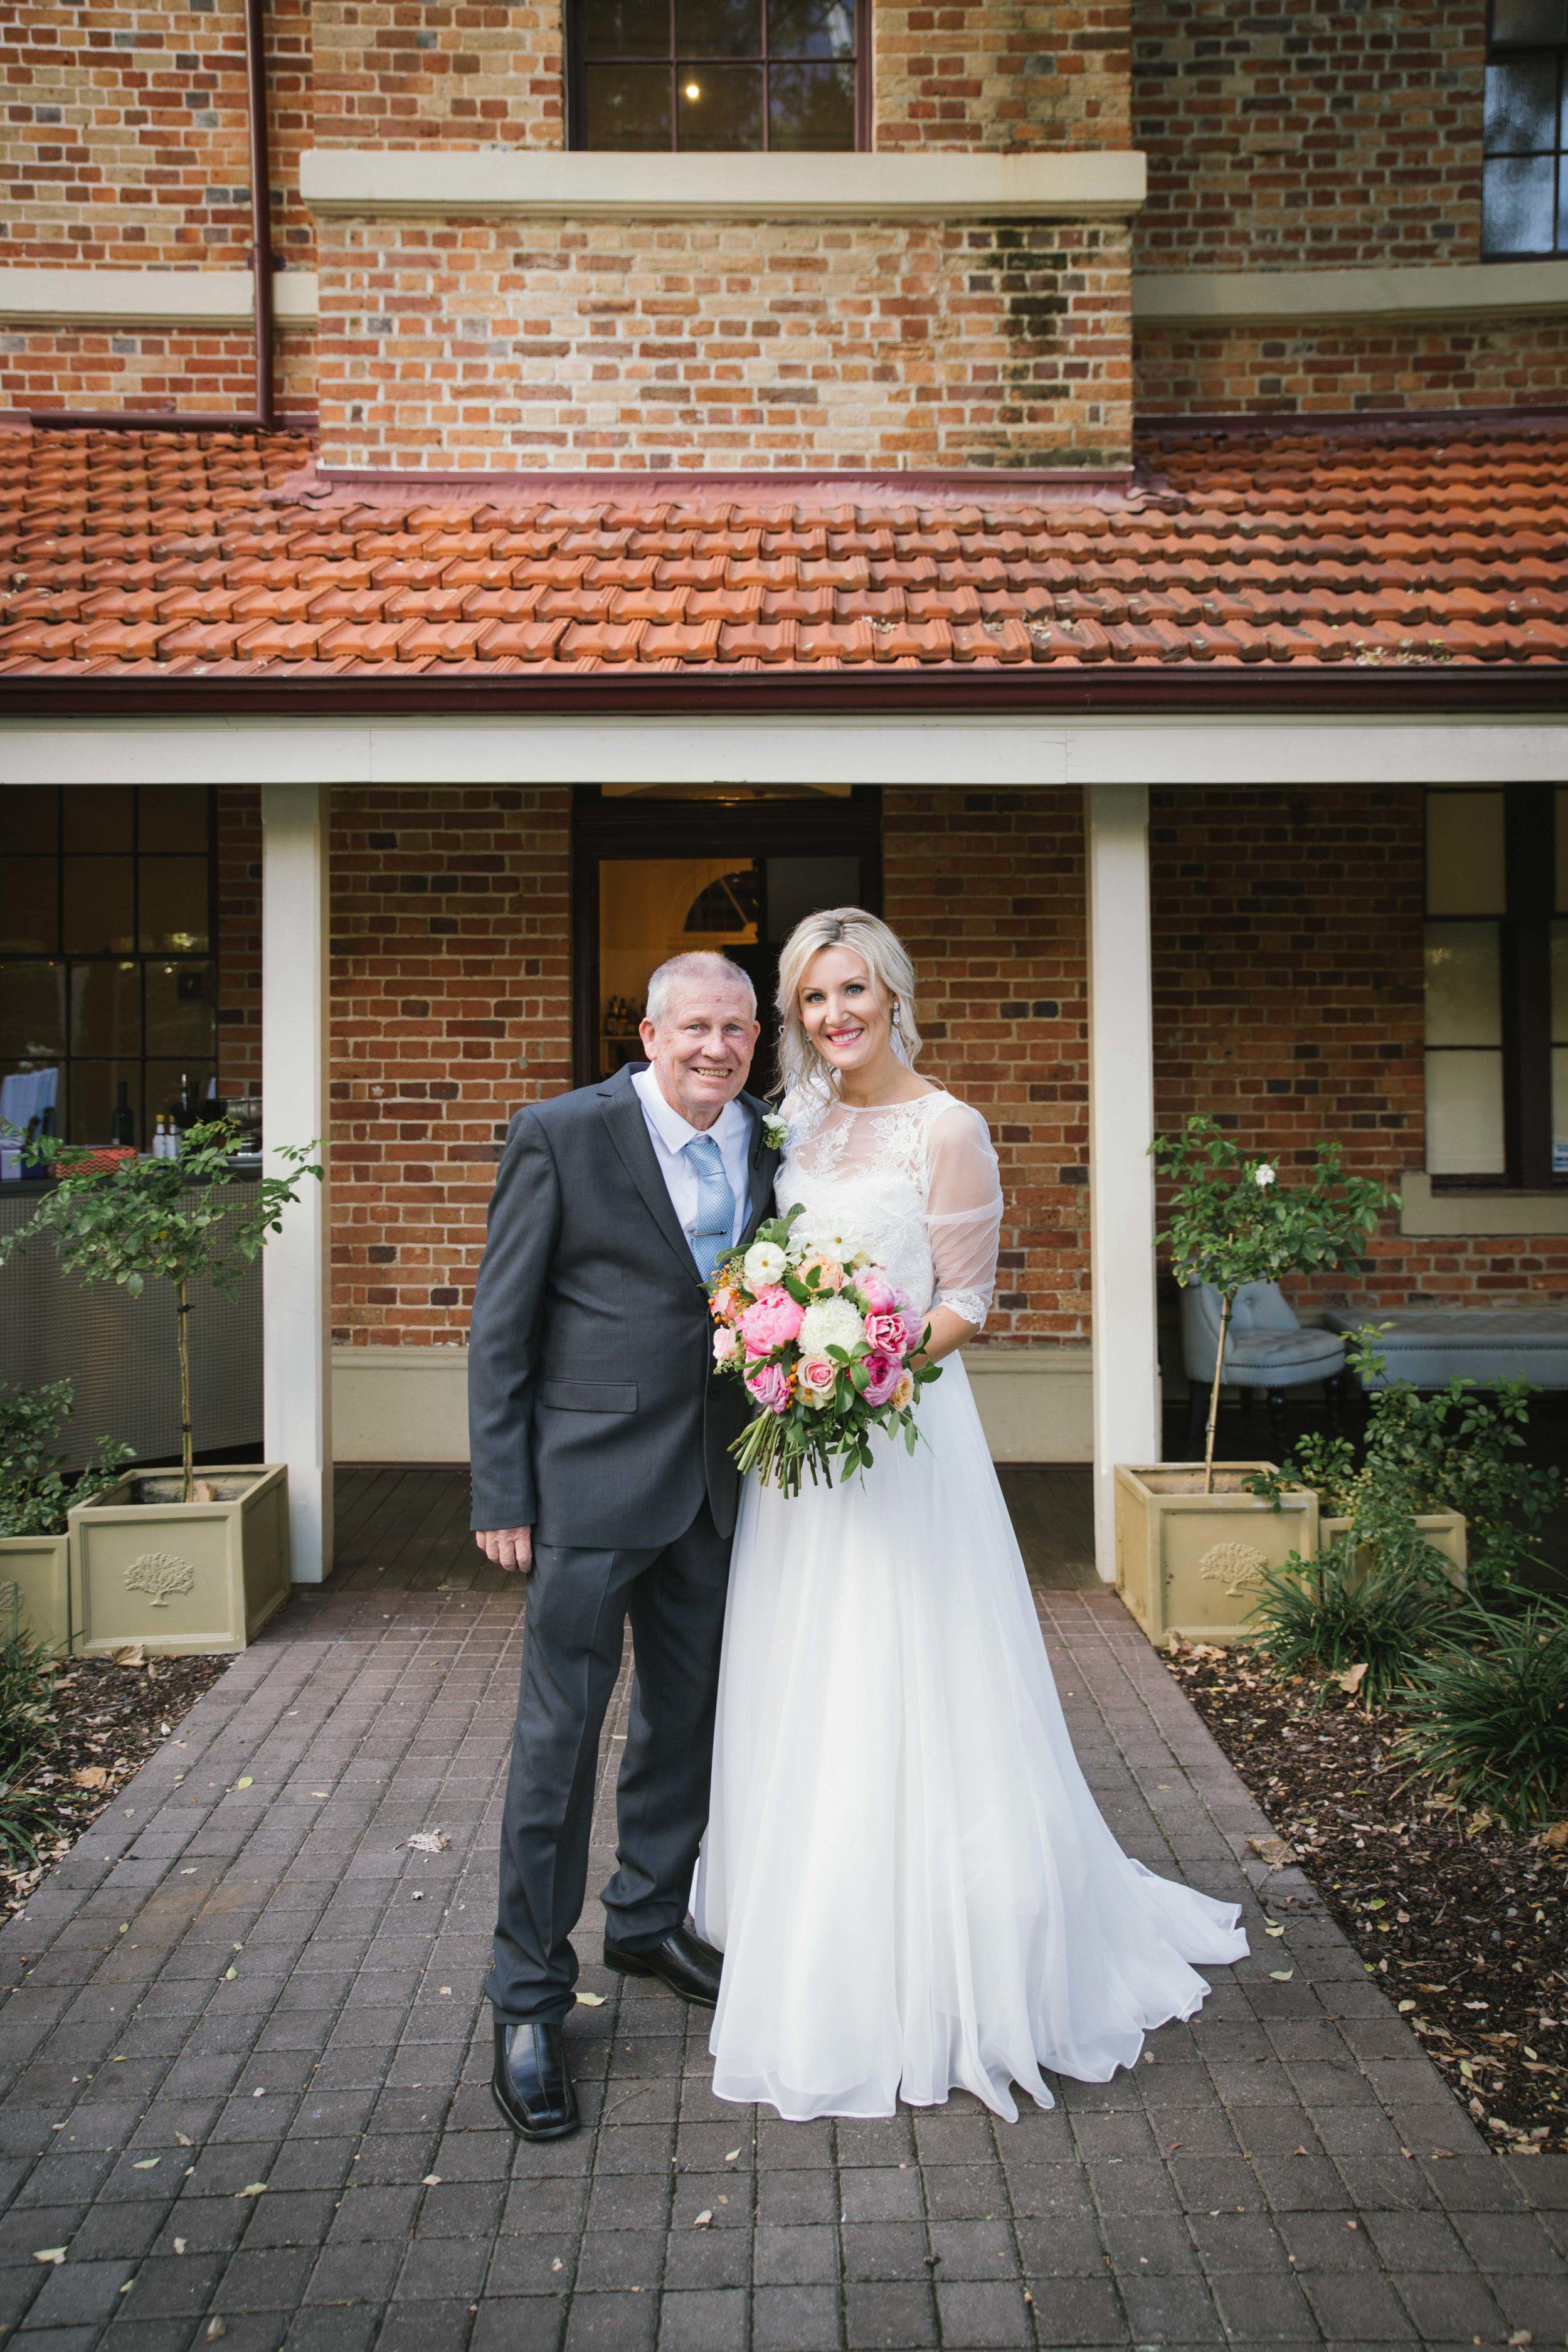 Lamonts Bishops House City Urban Perth Wheatbelt Avon Valley Wedding Photographer Photography (9).jpg